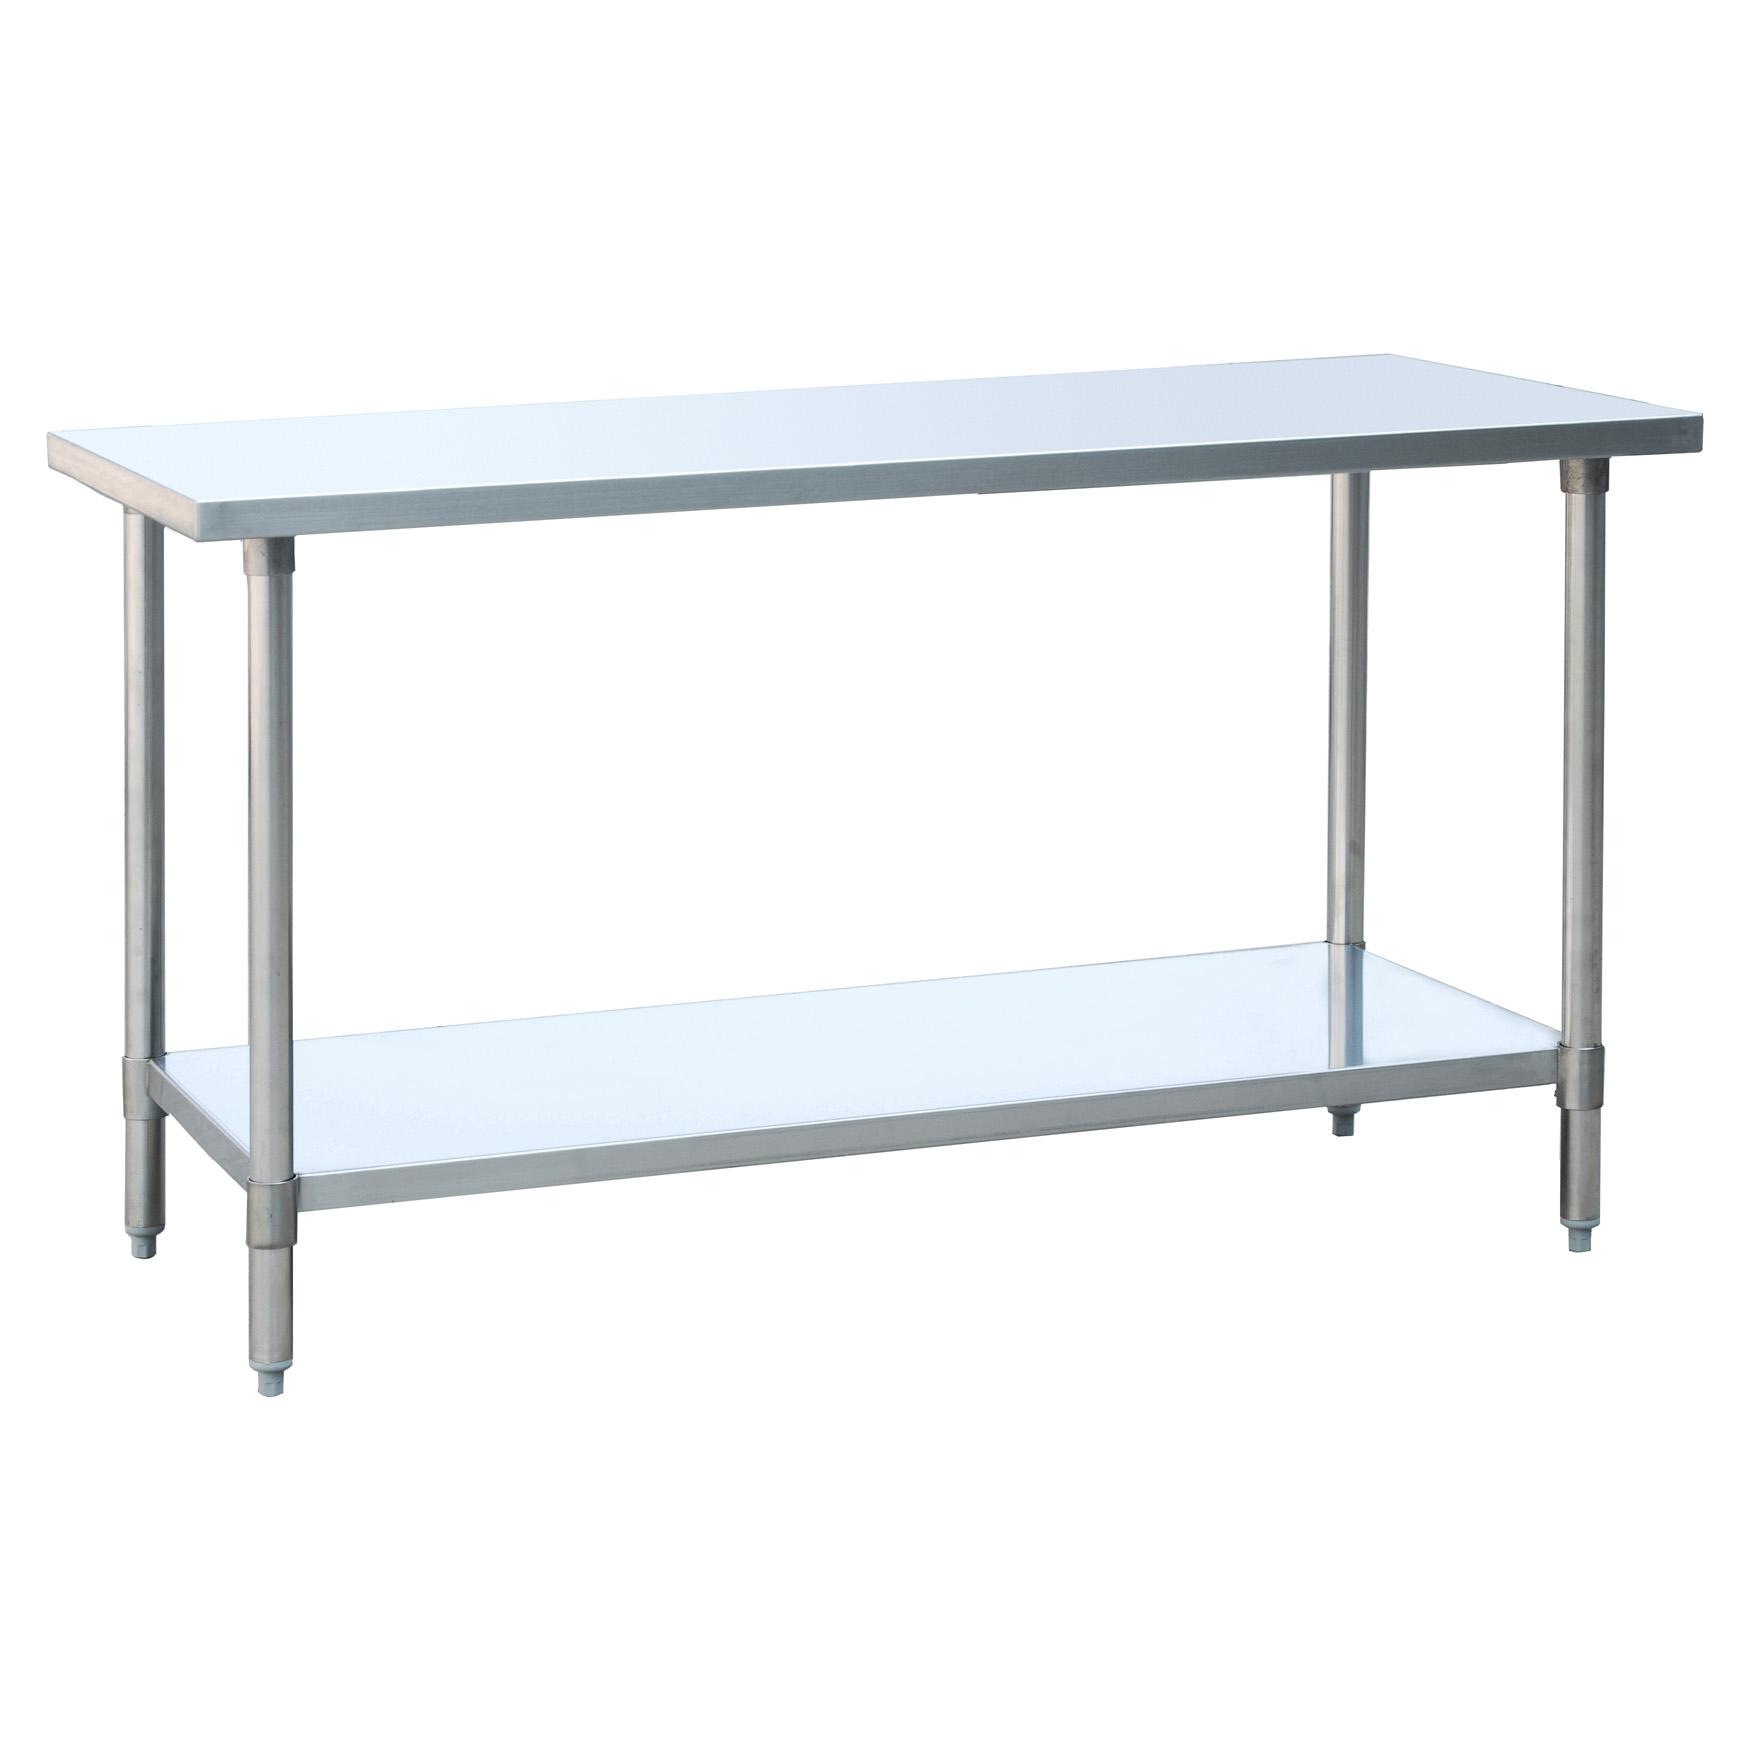 Atosa USA MRTW-3072 work table,  63